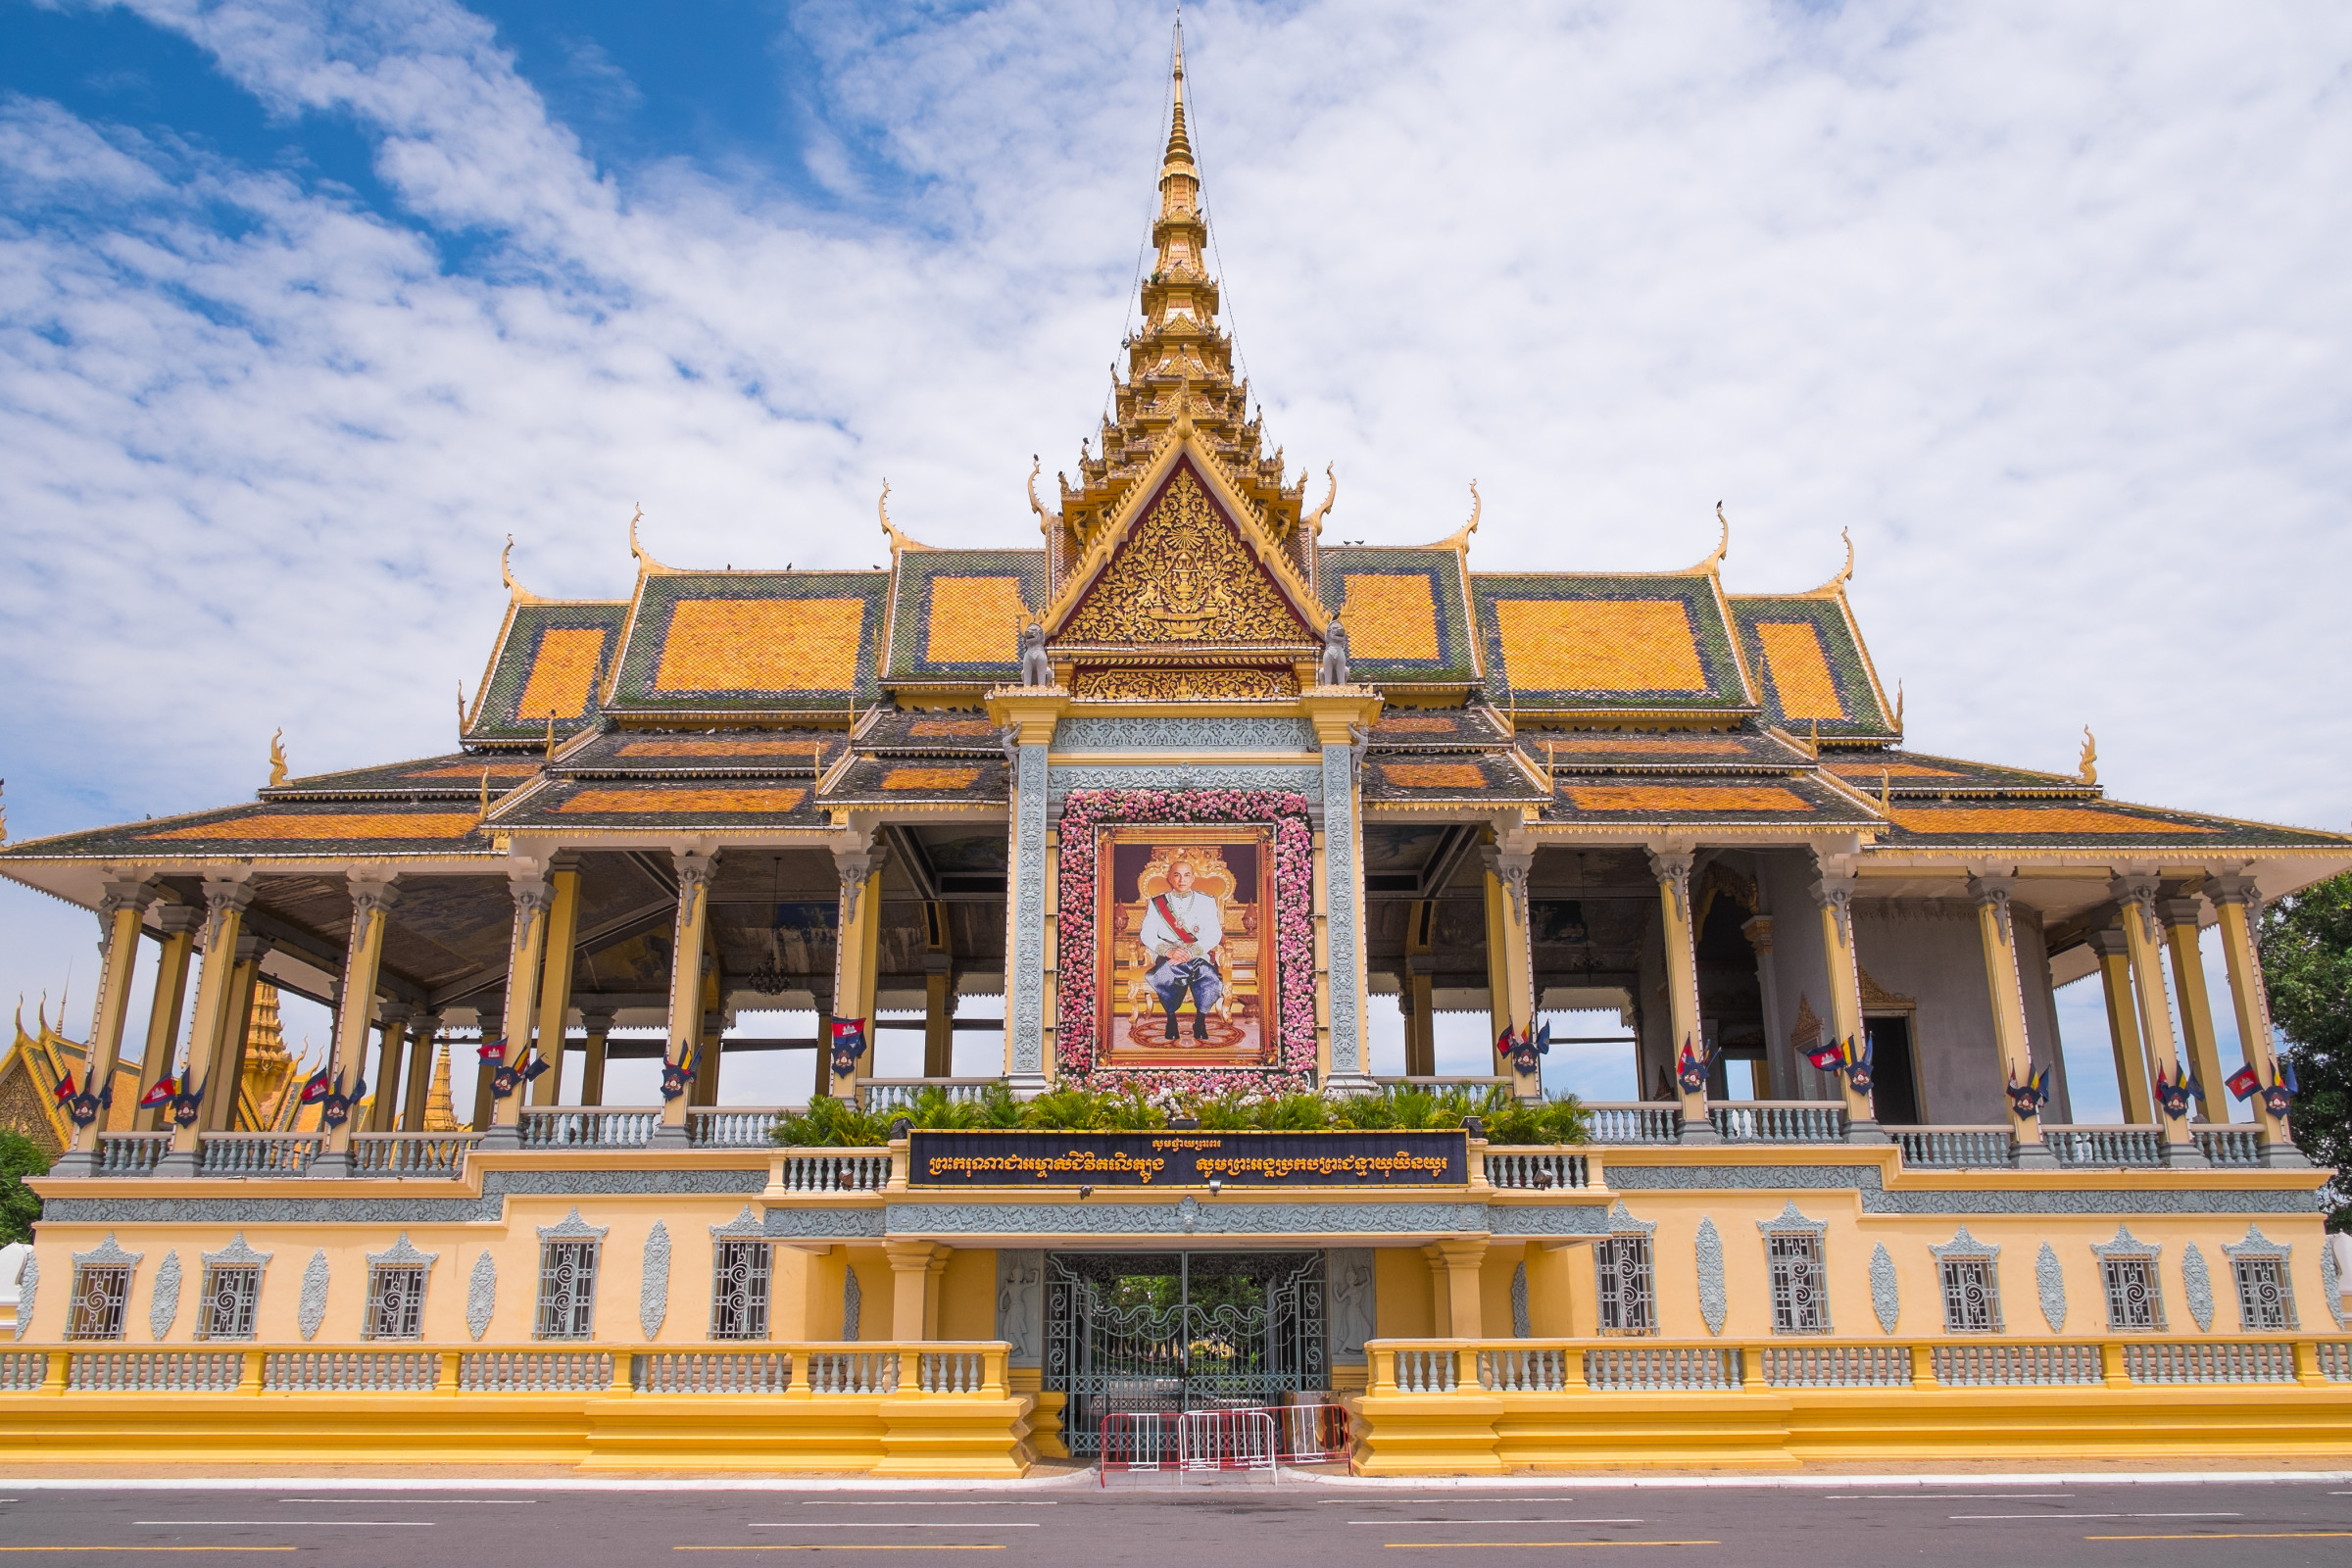 Phnompenh City Tour